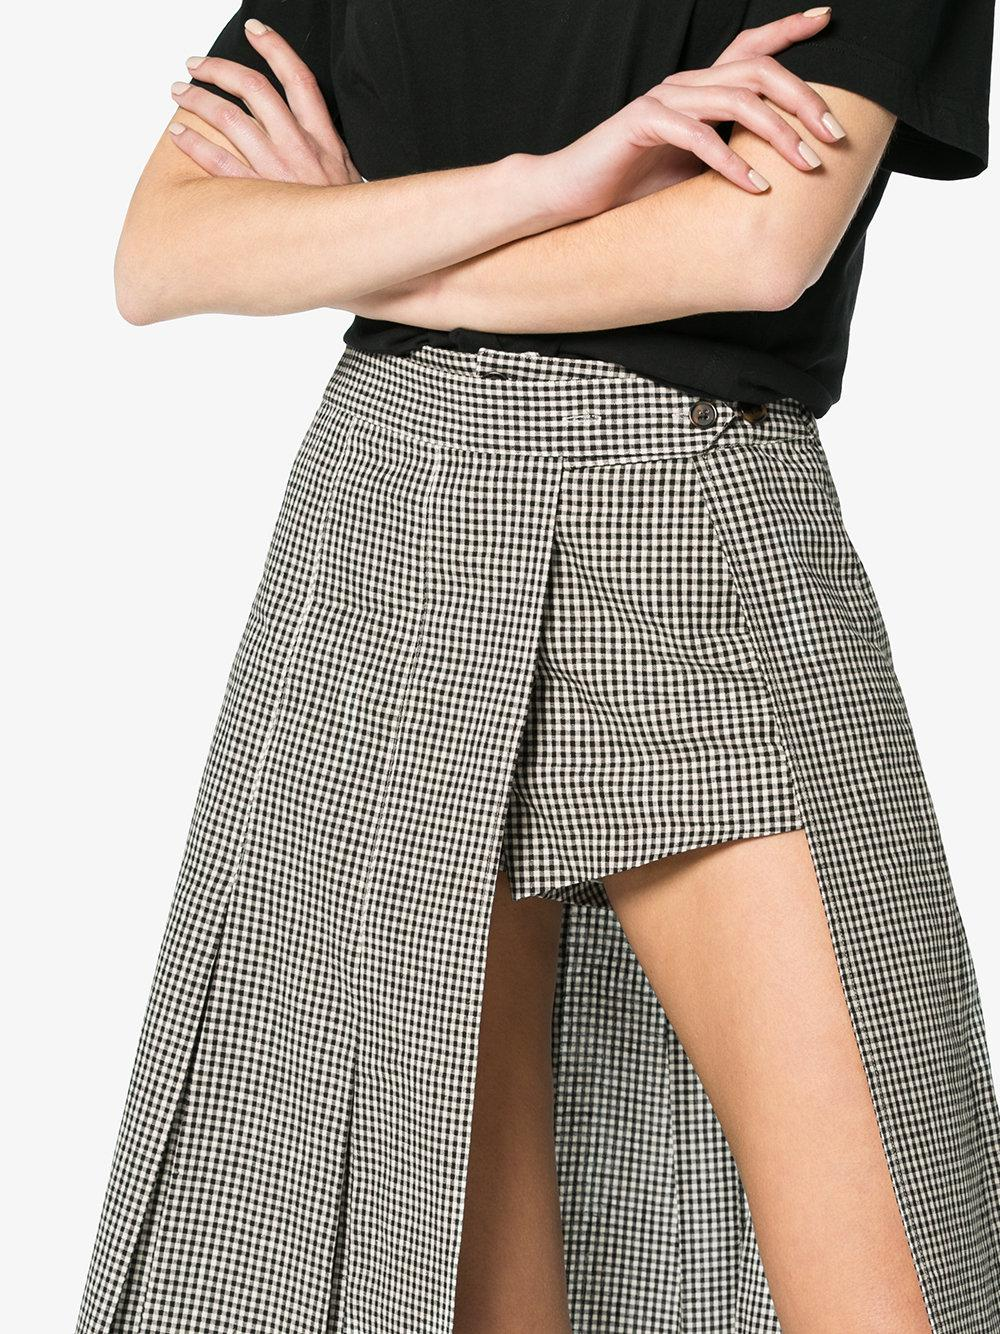 d360acf19a Sandy Liang Uniform Plaid Skort in Black - Lyst